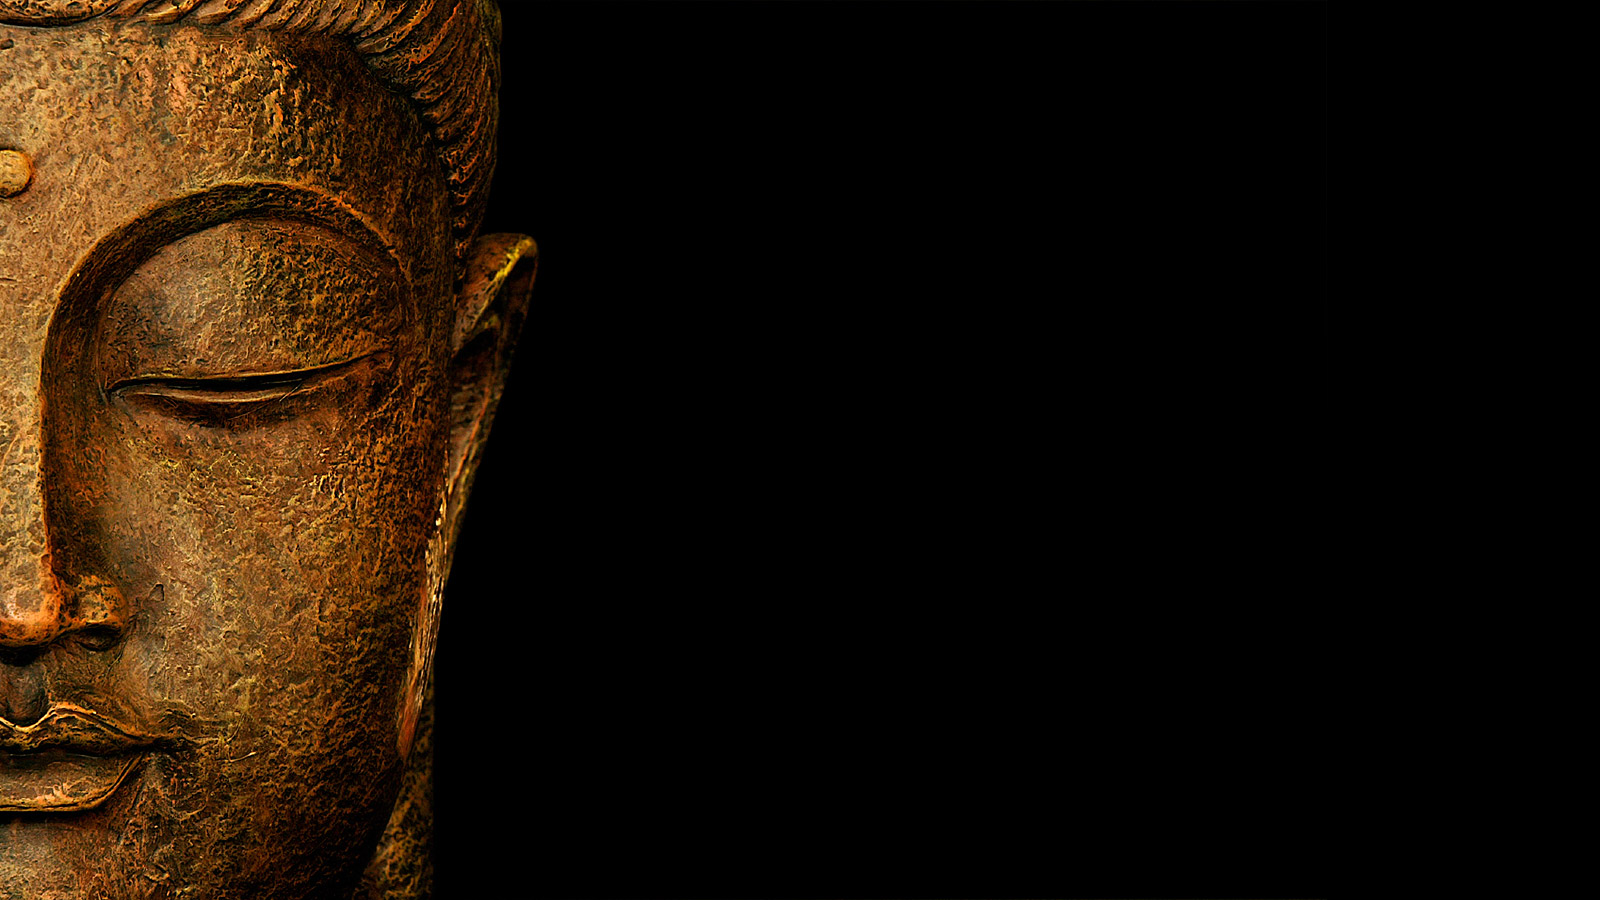 download DOWNLOAD Buddha Siddhartha Gotama Awareness and 1600x900